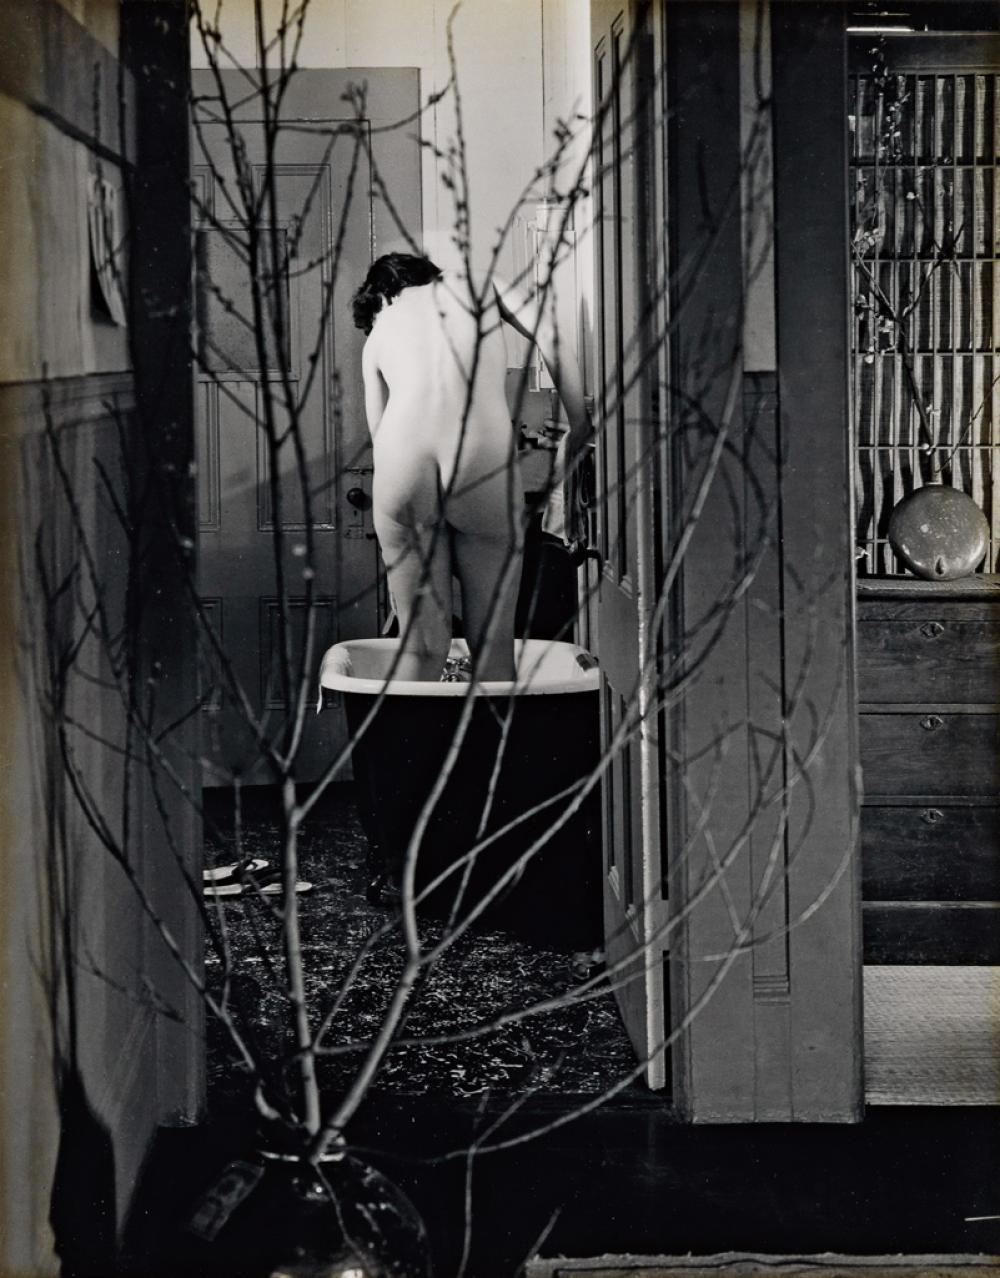 IMOGEN CUNNINGHAM (1883-1976) The Bath.